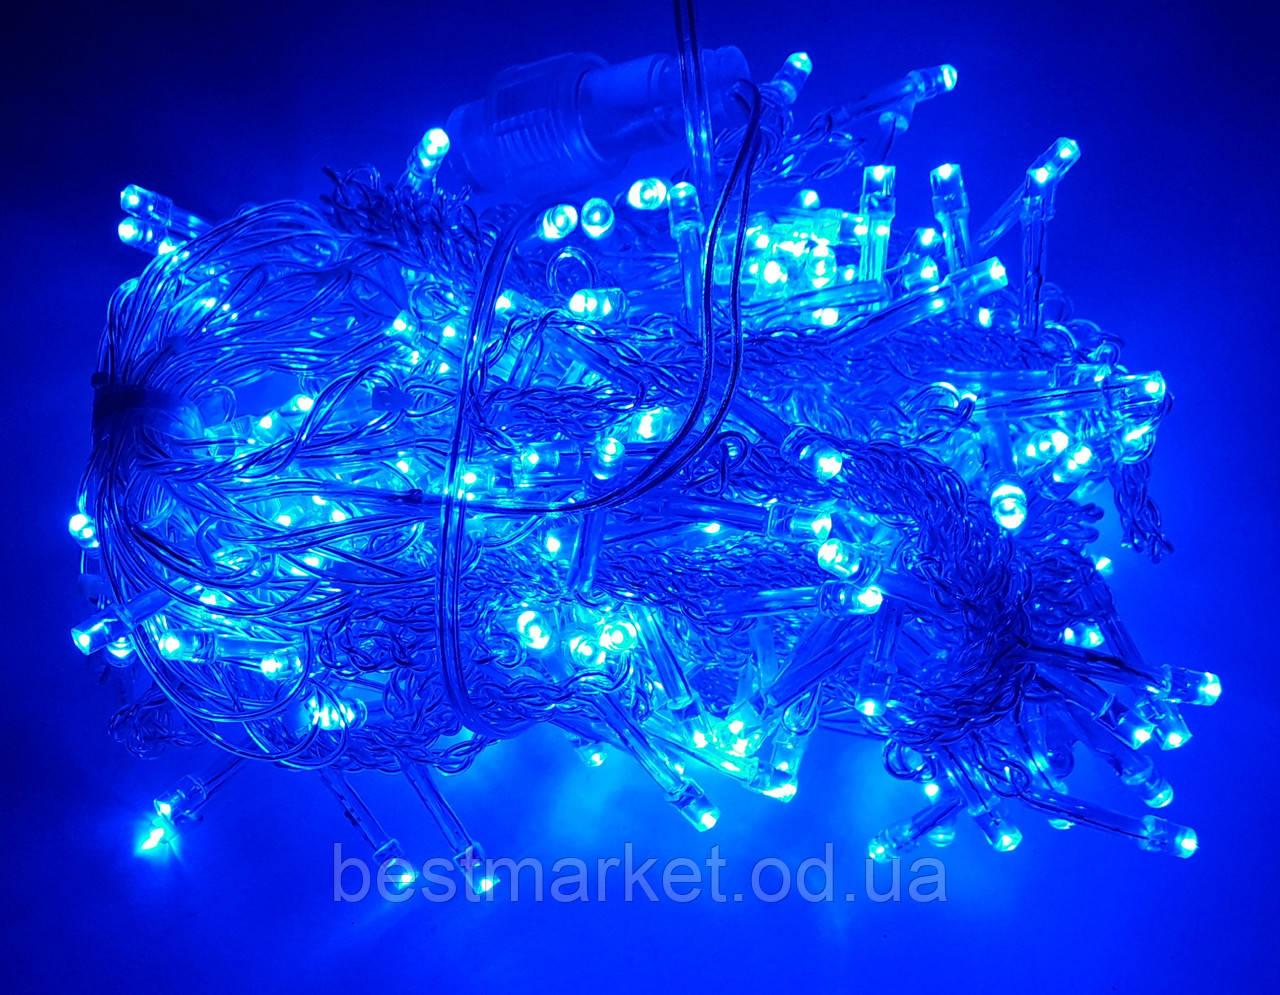 Светодиодная Гирлянда Штора 240 Led - В 1,5 х 1,5 м Синий